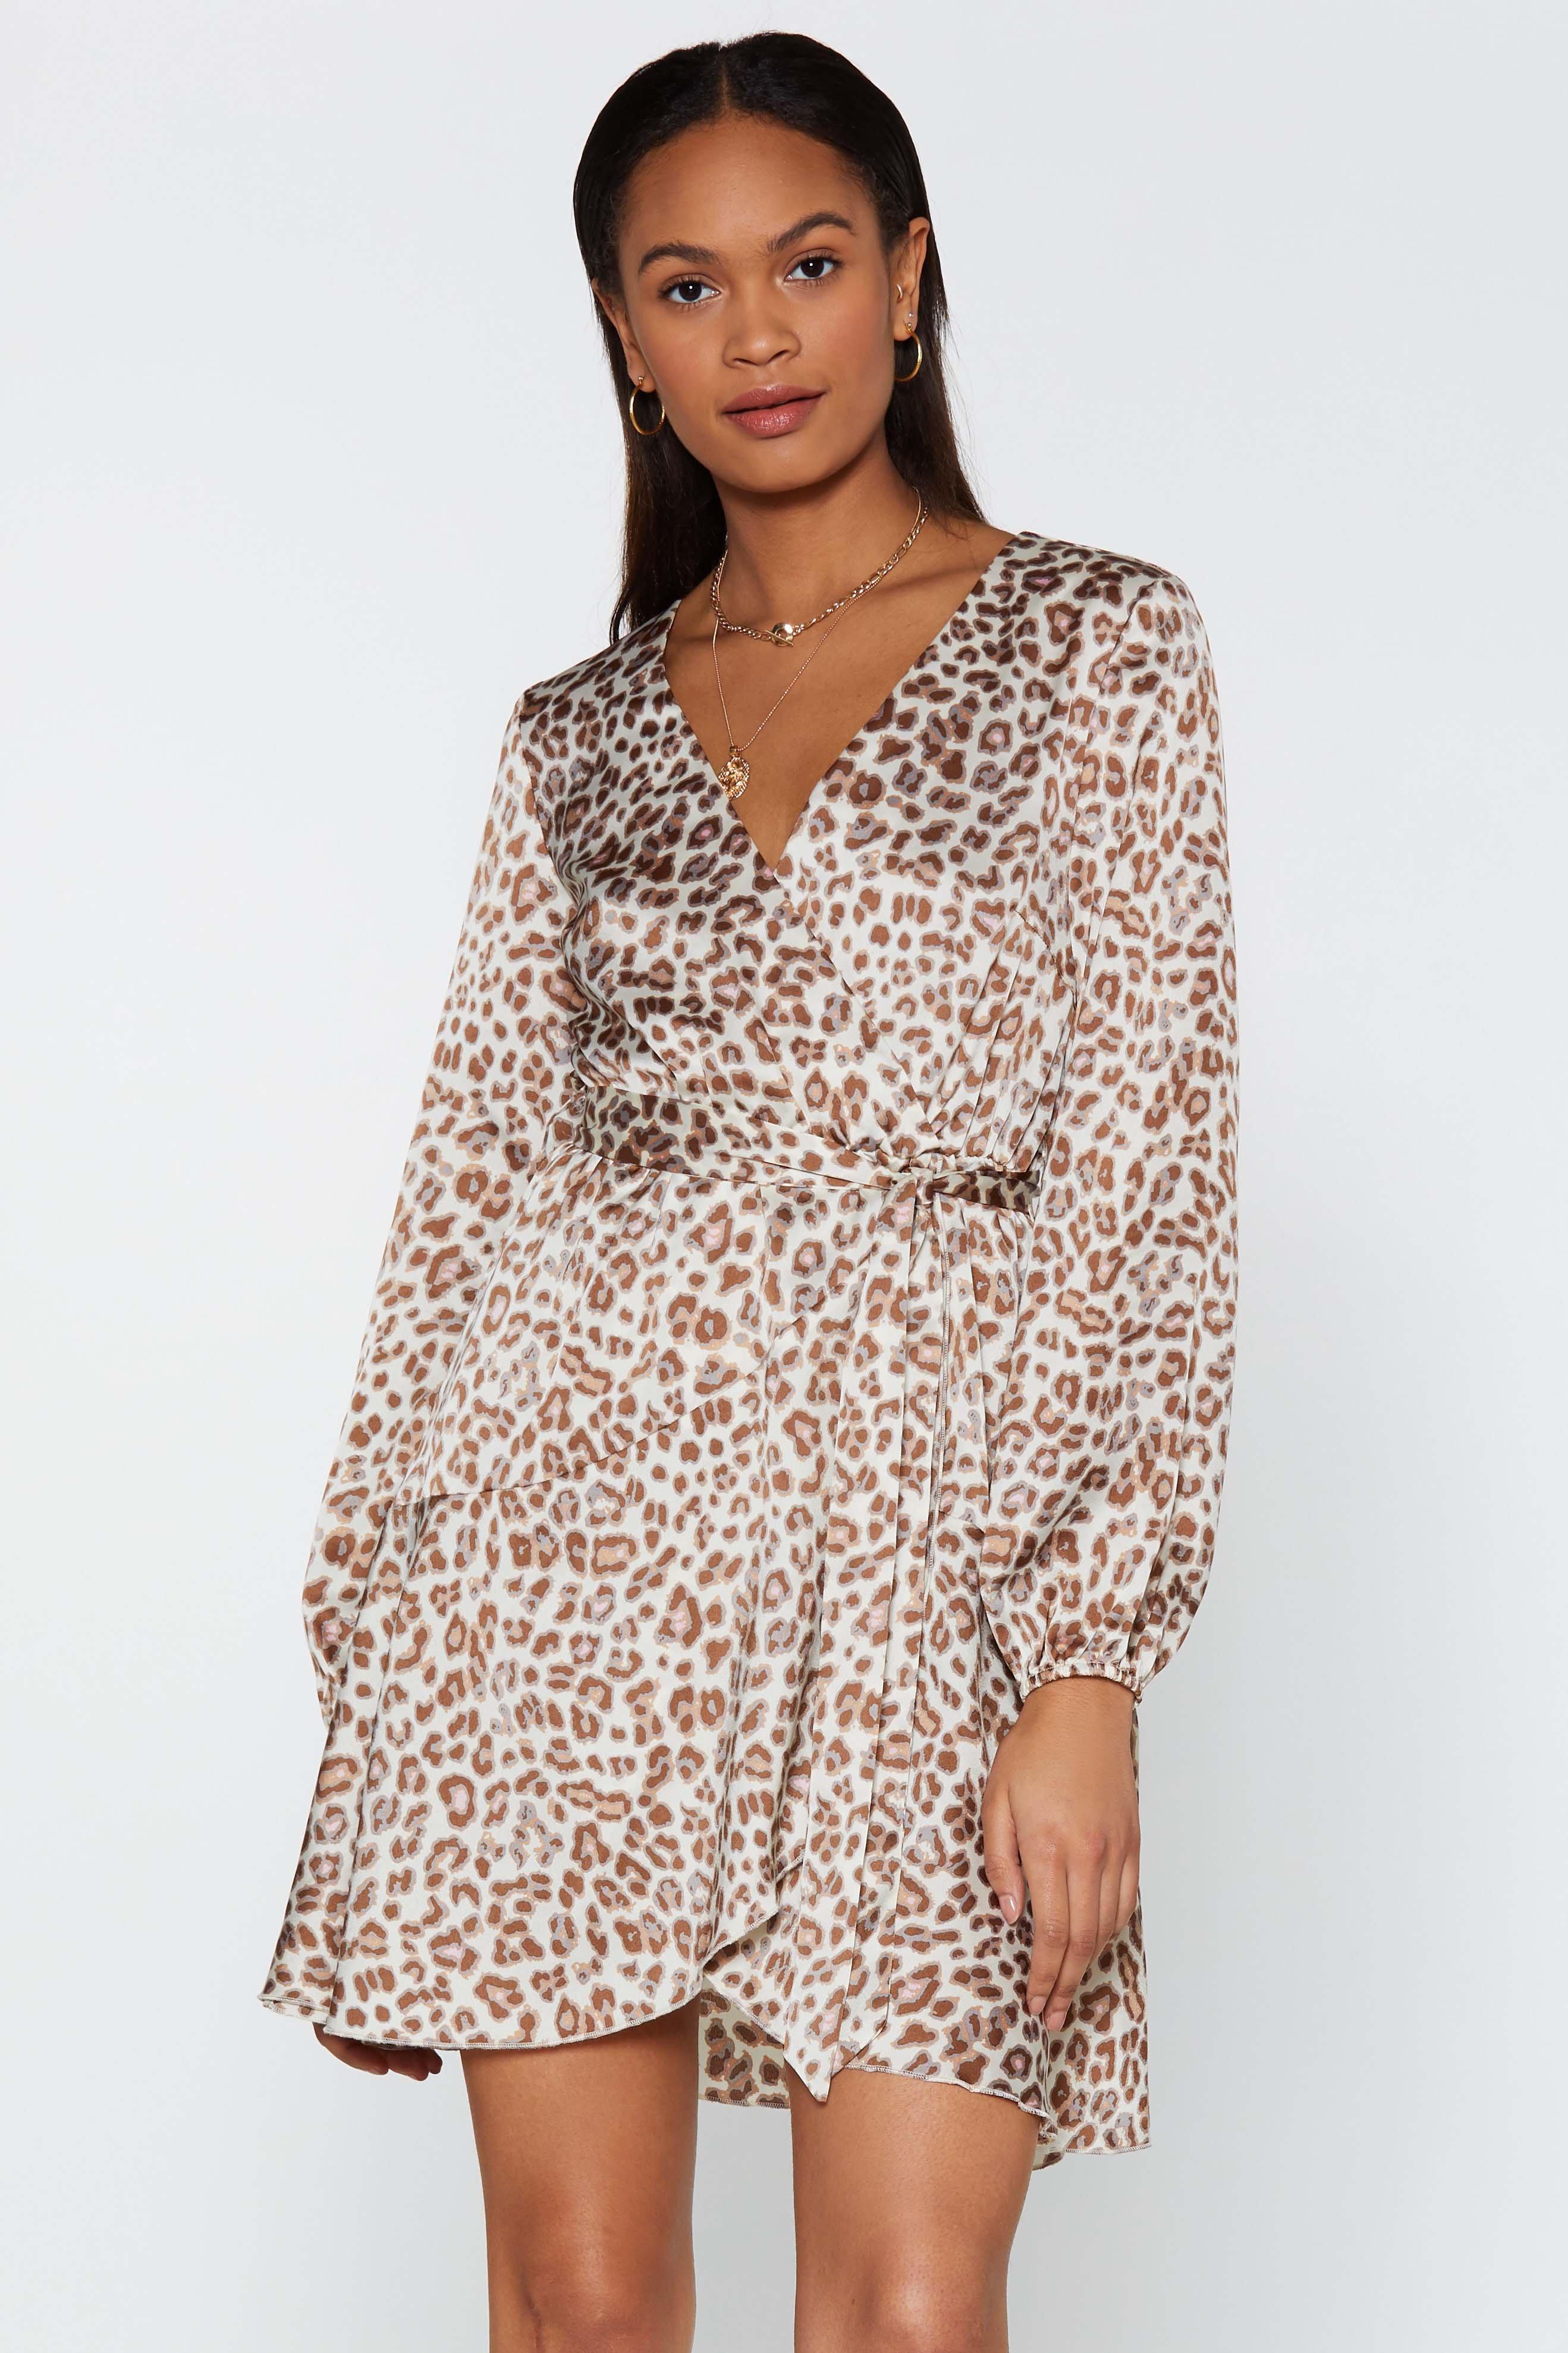 Tattle Tail Leopard Dress by Nasty Gal